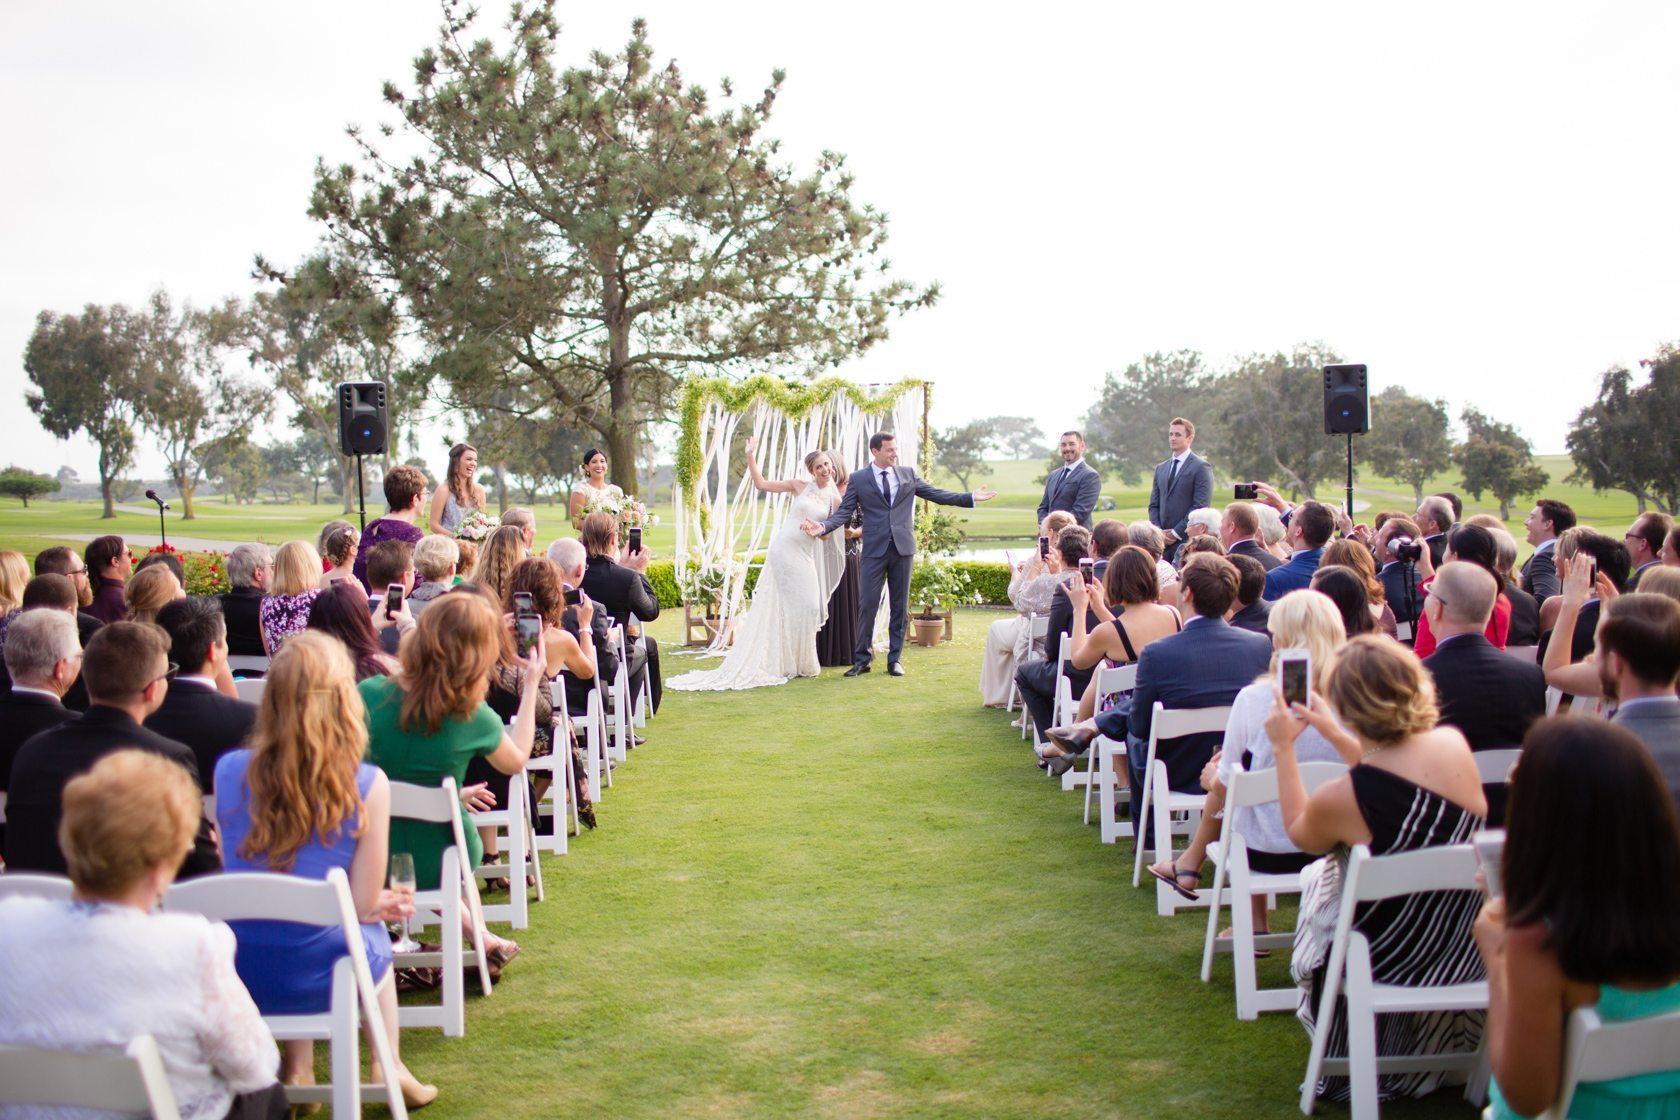 The_Lodge_at_Torrey_Pines_Wedding_049.jpg